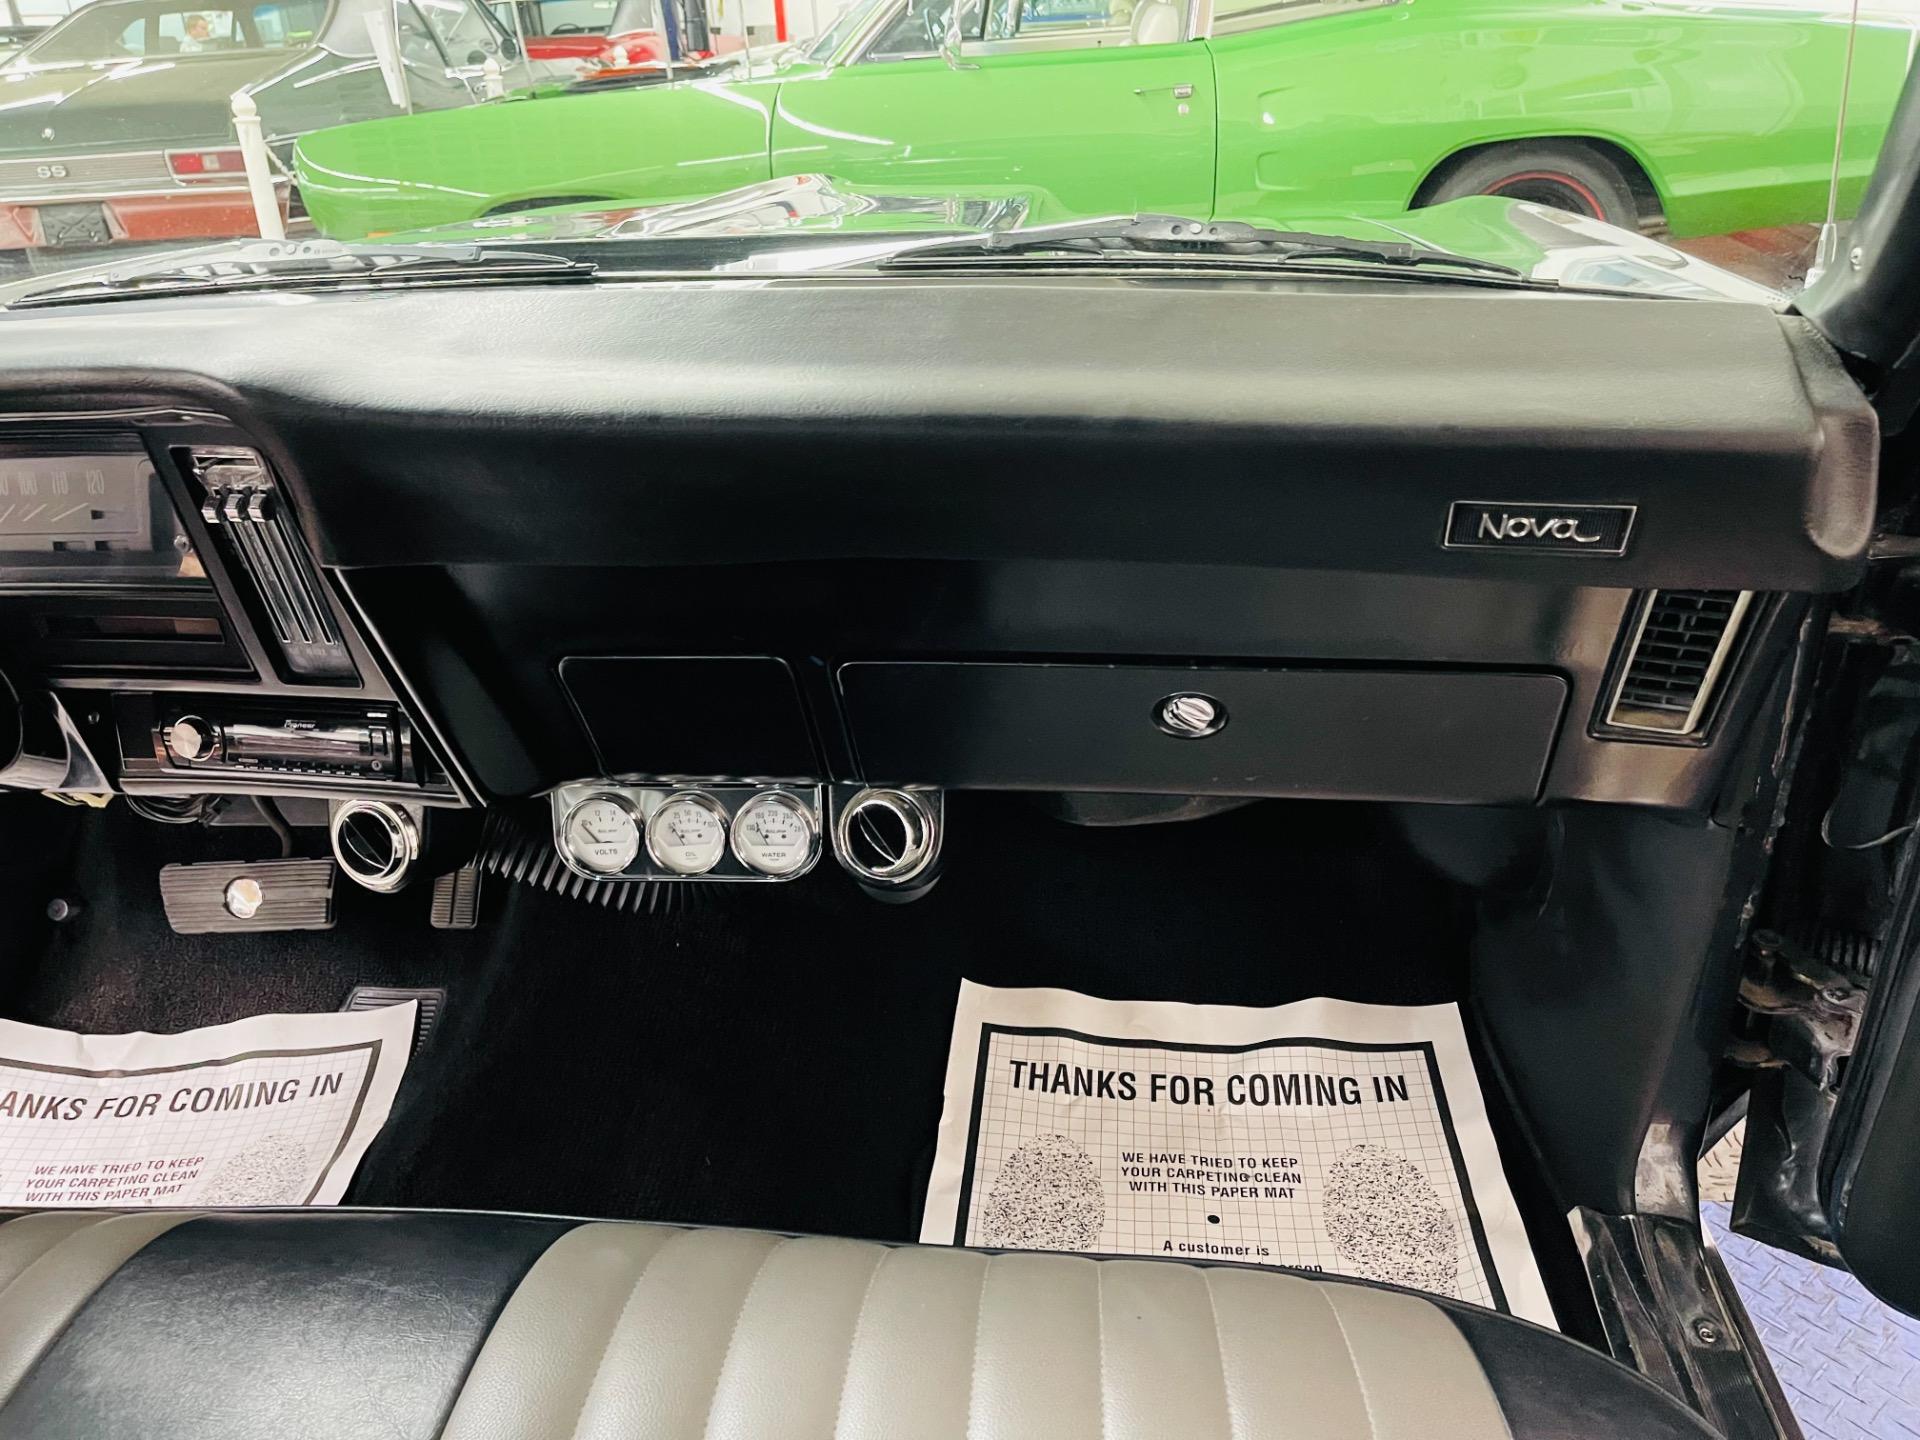 Used 1972 Chevrolet Nova - 350 ENGINE - AUTO TRANS - MODERN A/C - SEE VIDEO   Mundelein, IL